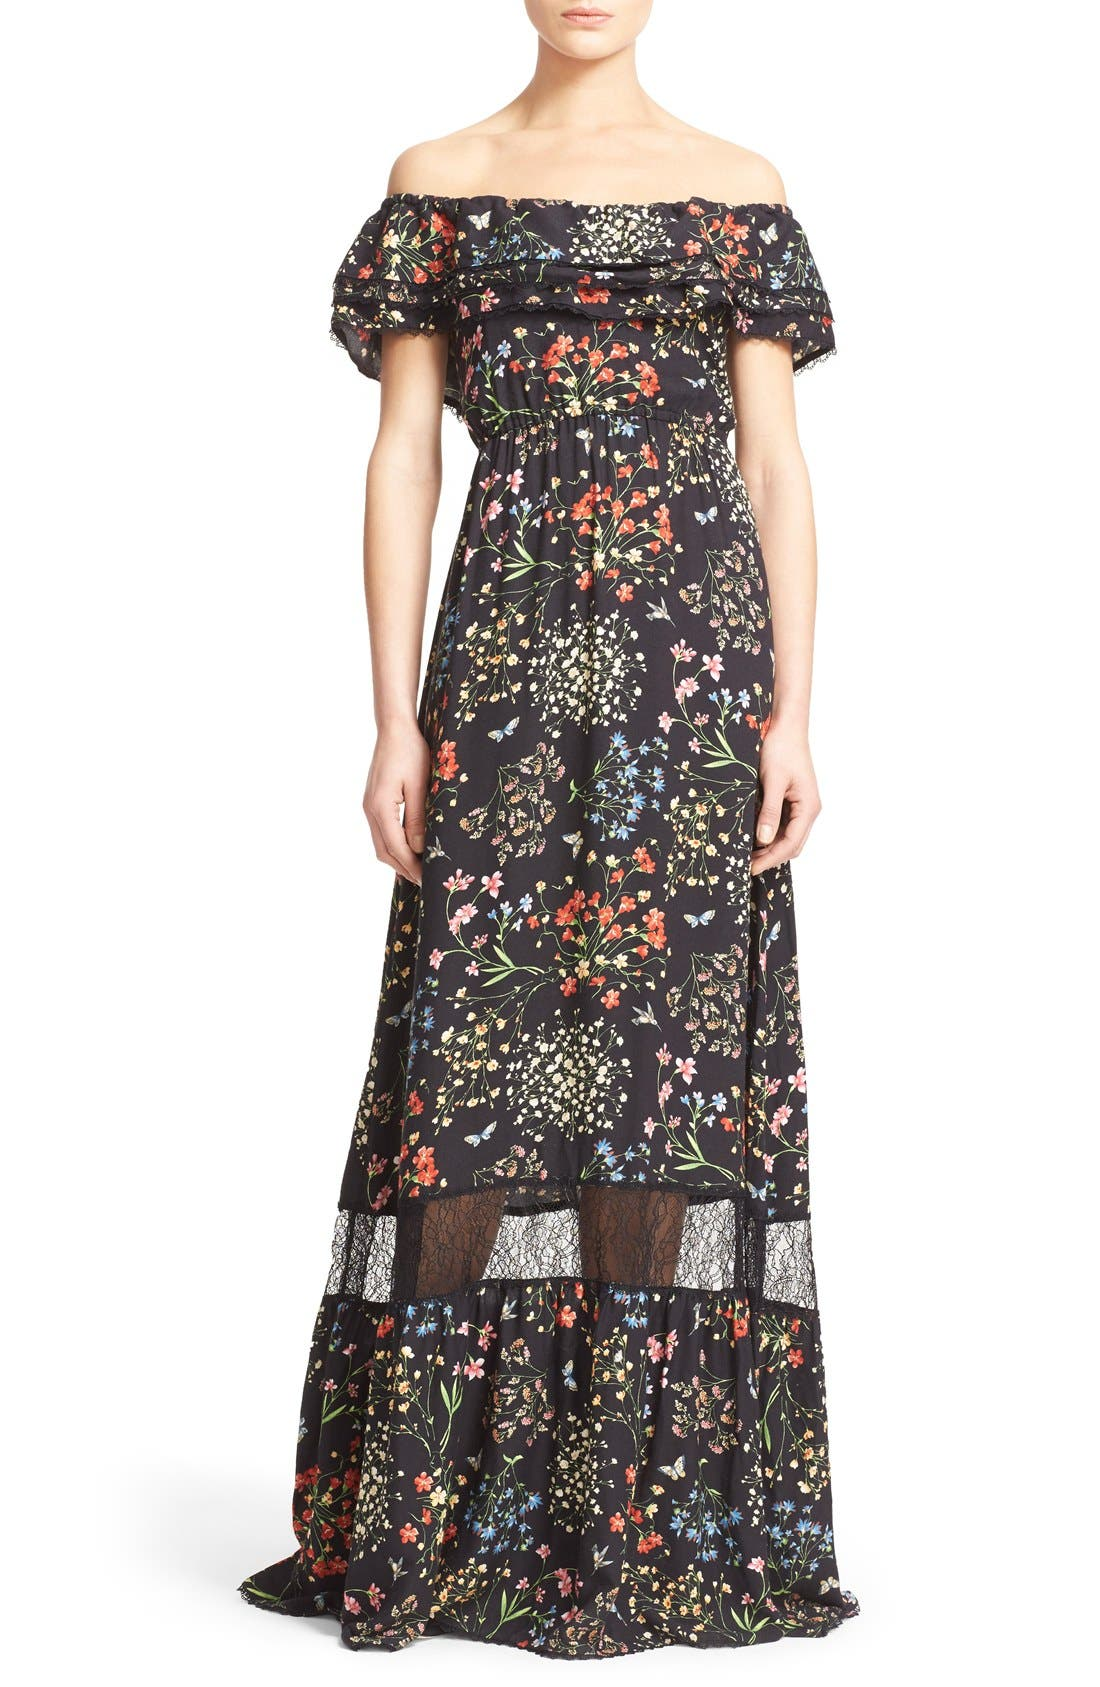 Alternate Image 1 Selected - Alice + Olivia 'Cheri' Floral Print Off the Shoulder Maxi Dress